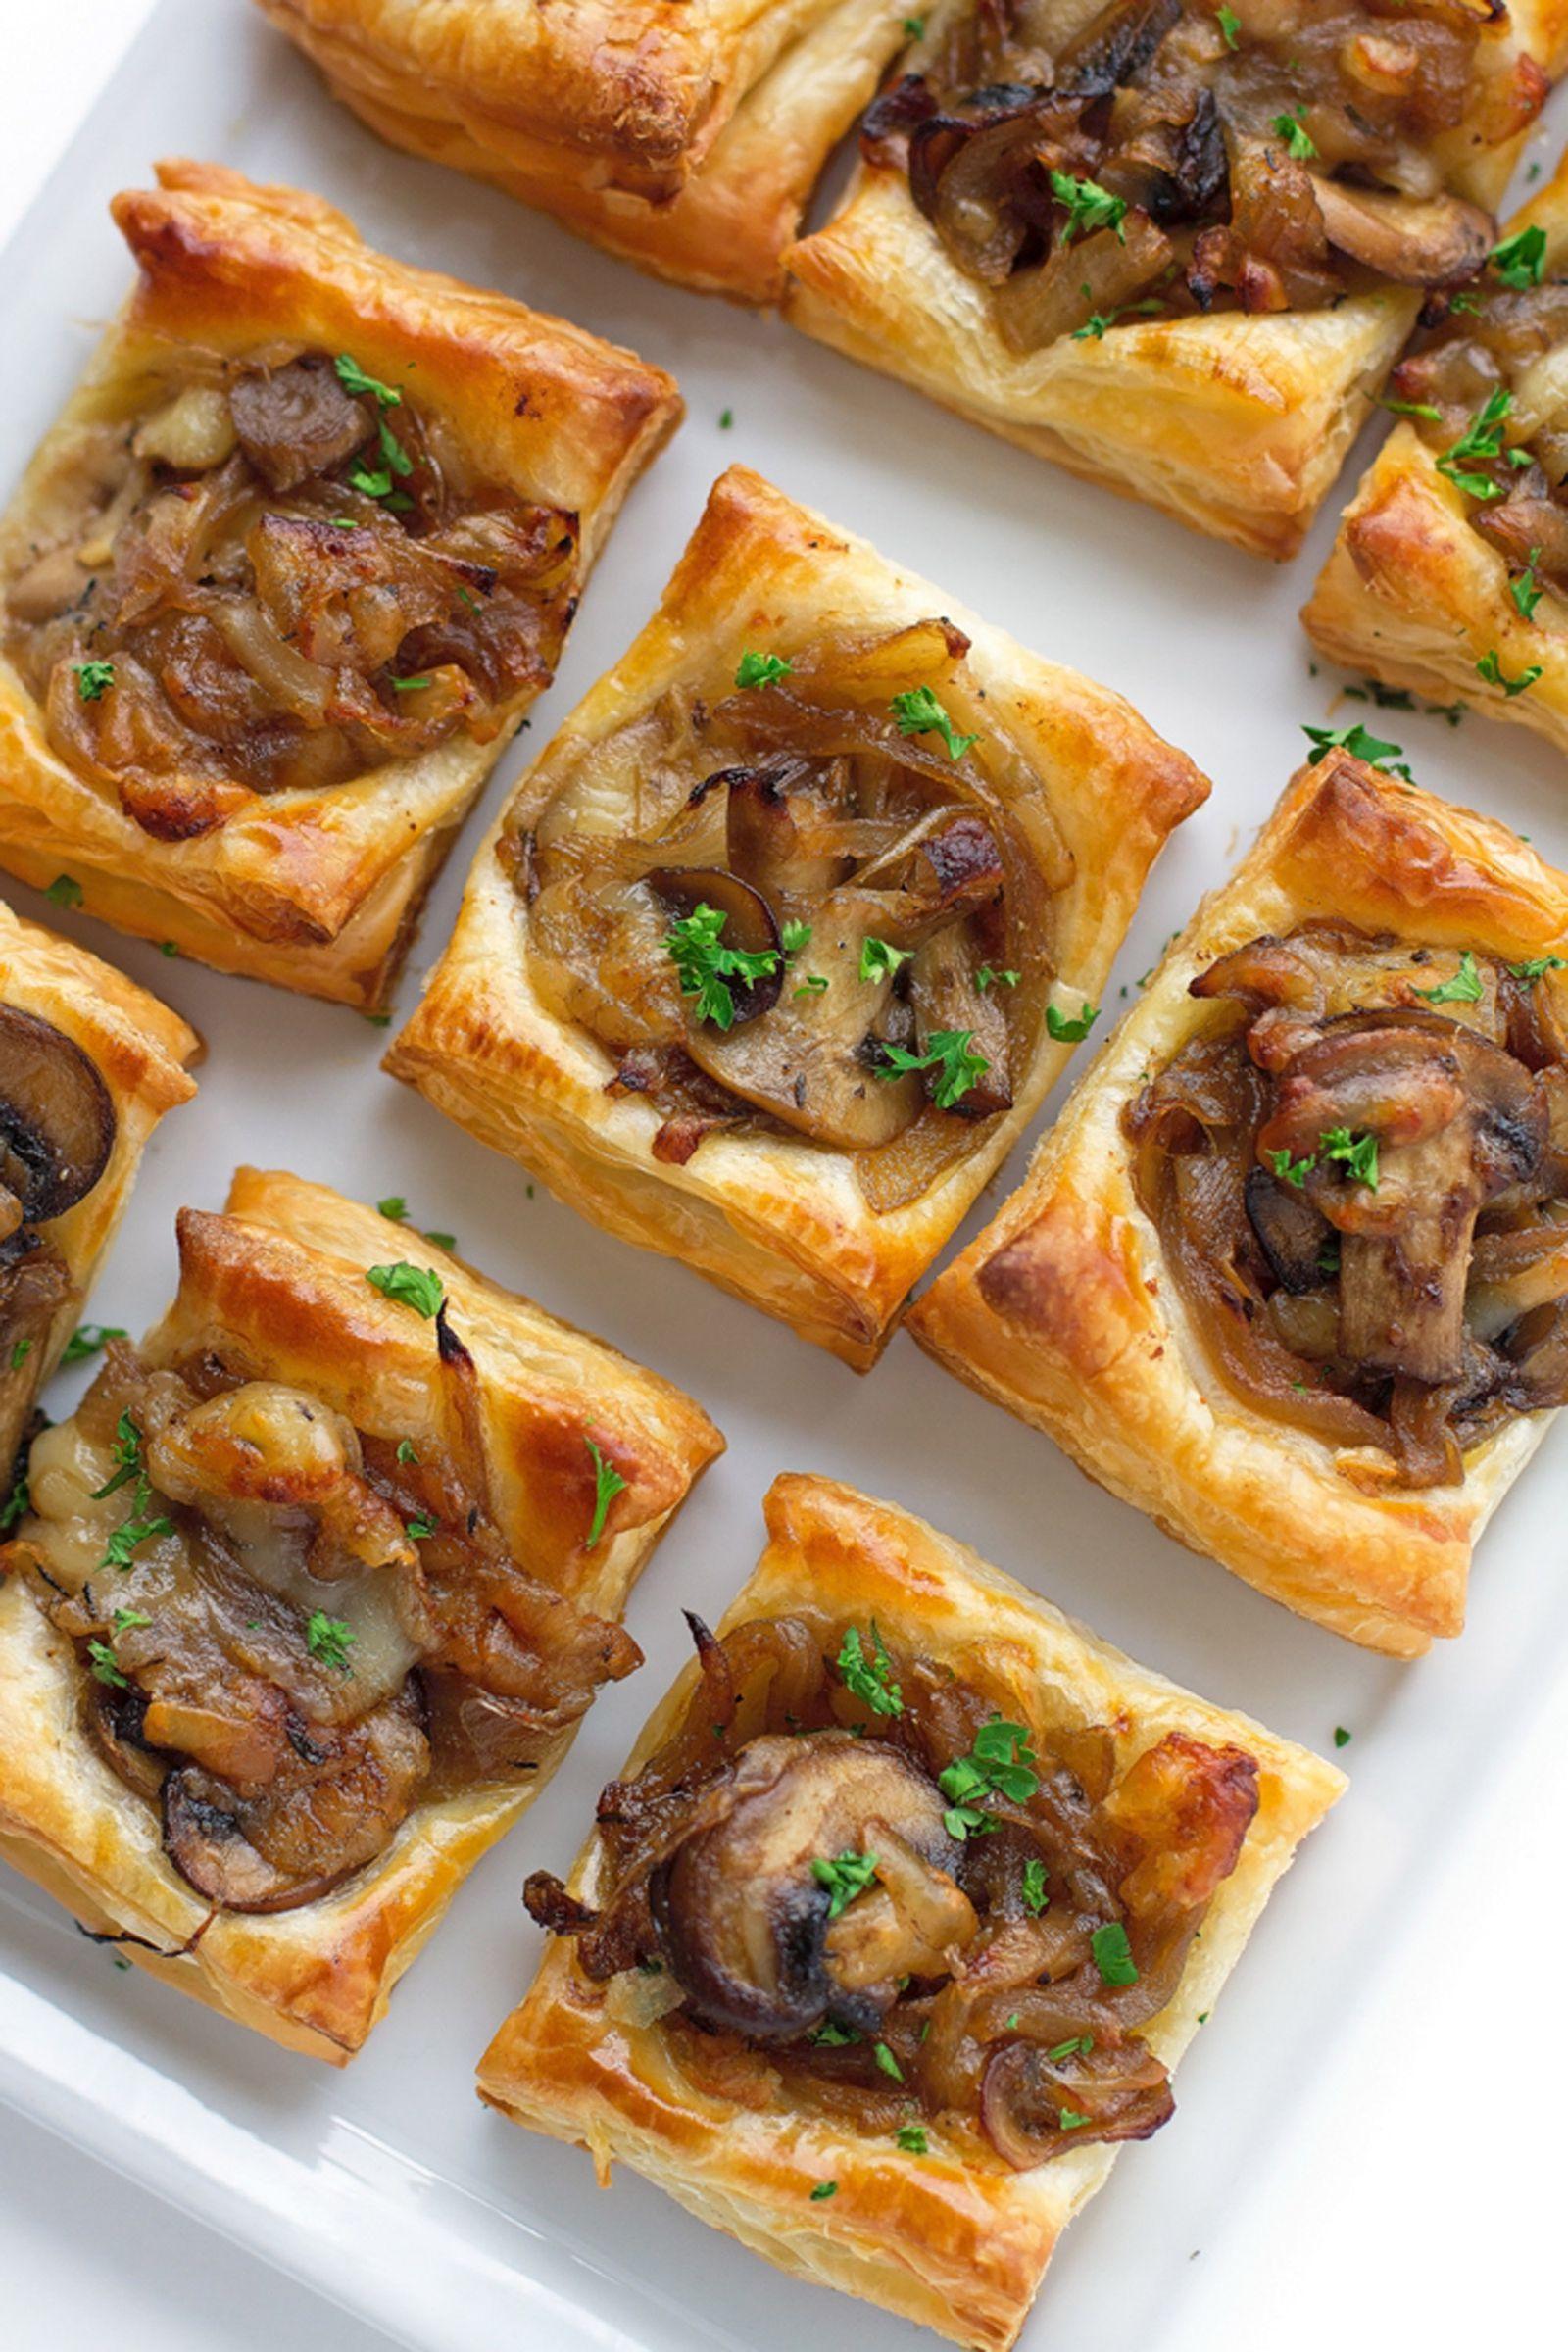 Gruyere, Mushroom, And Caramelized Onion Bitescountryliving